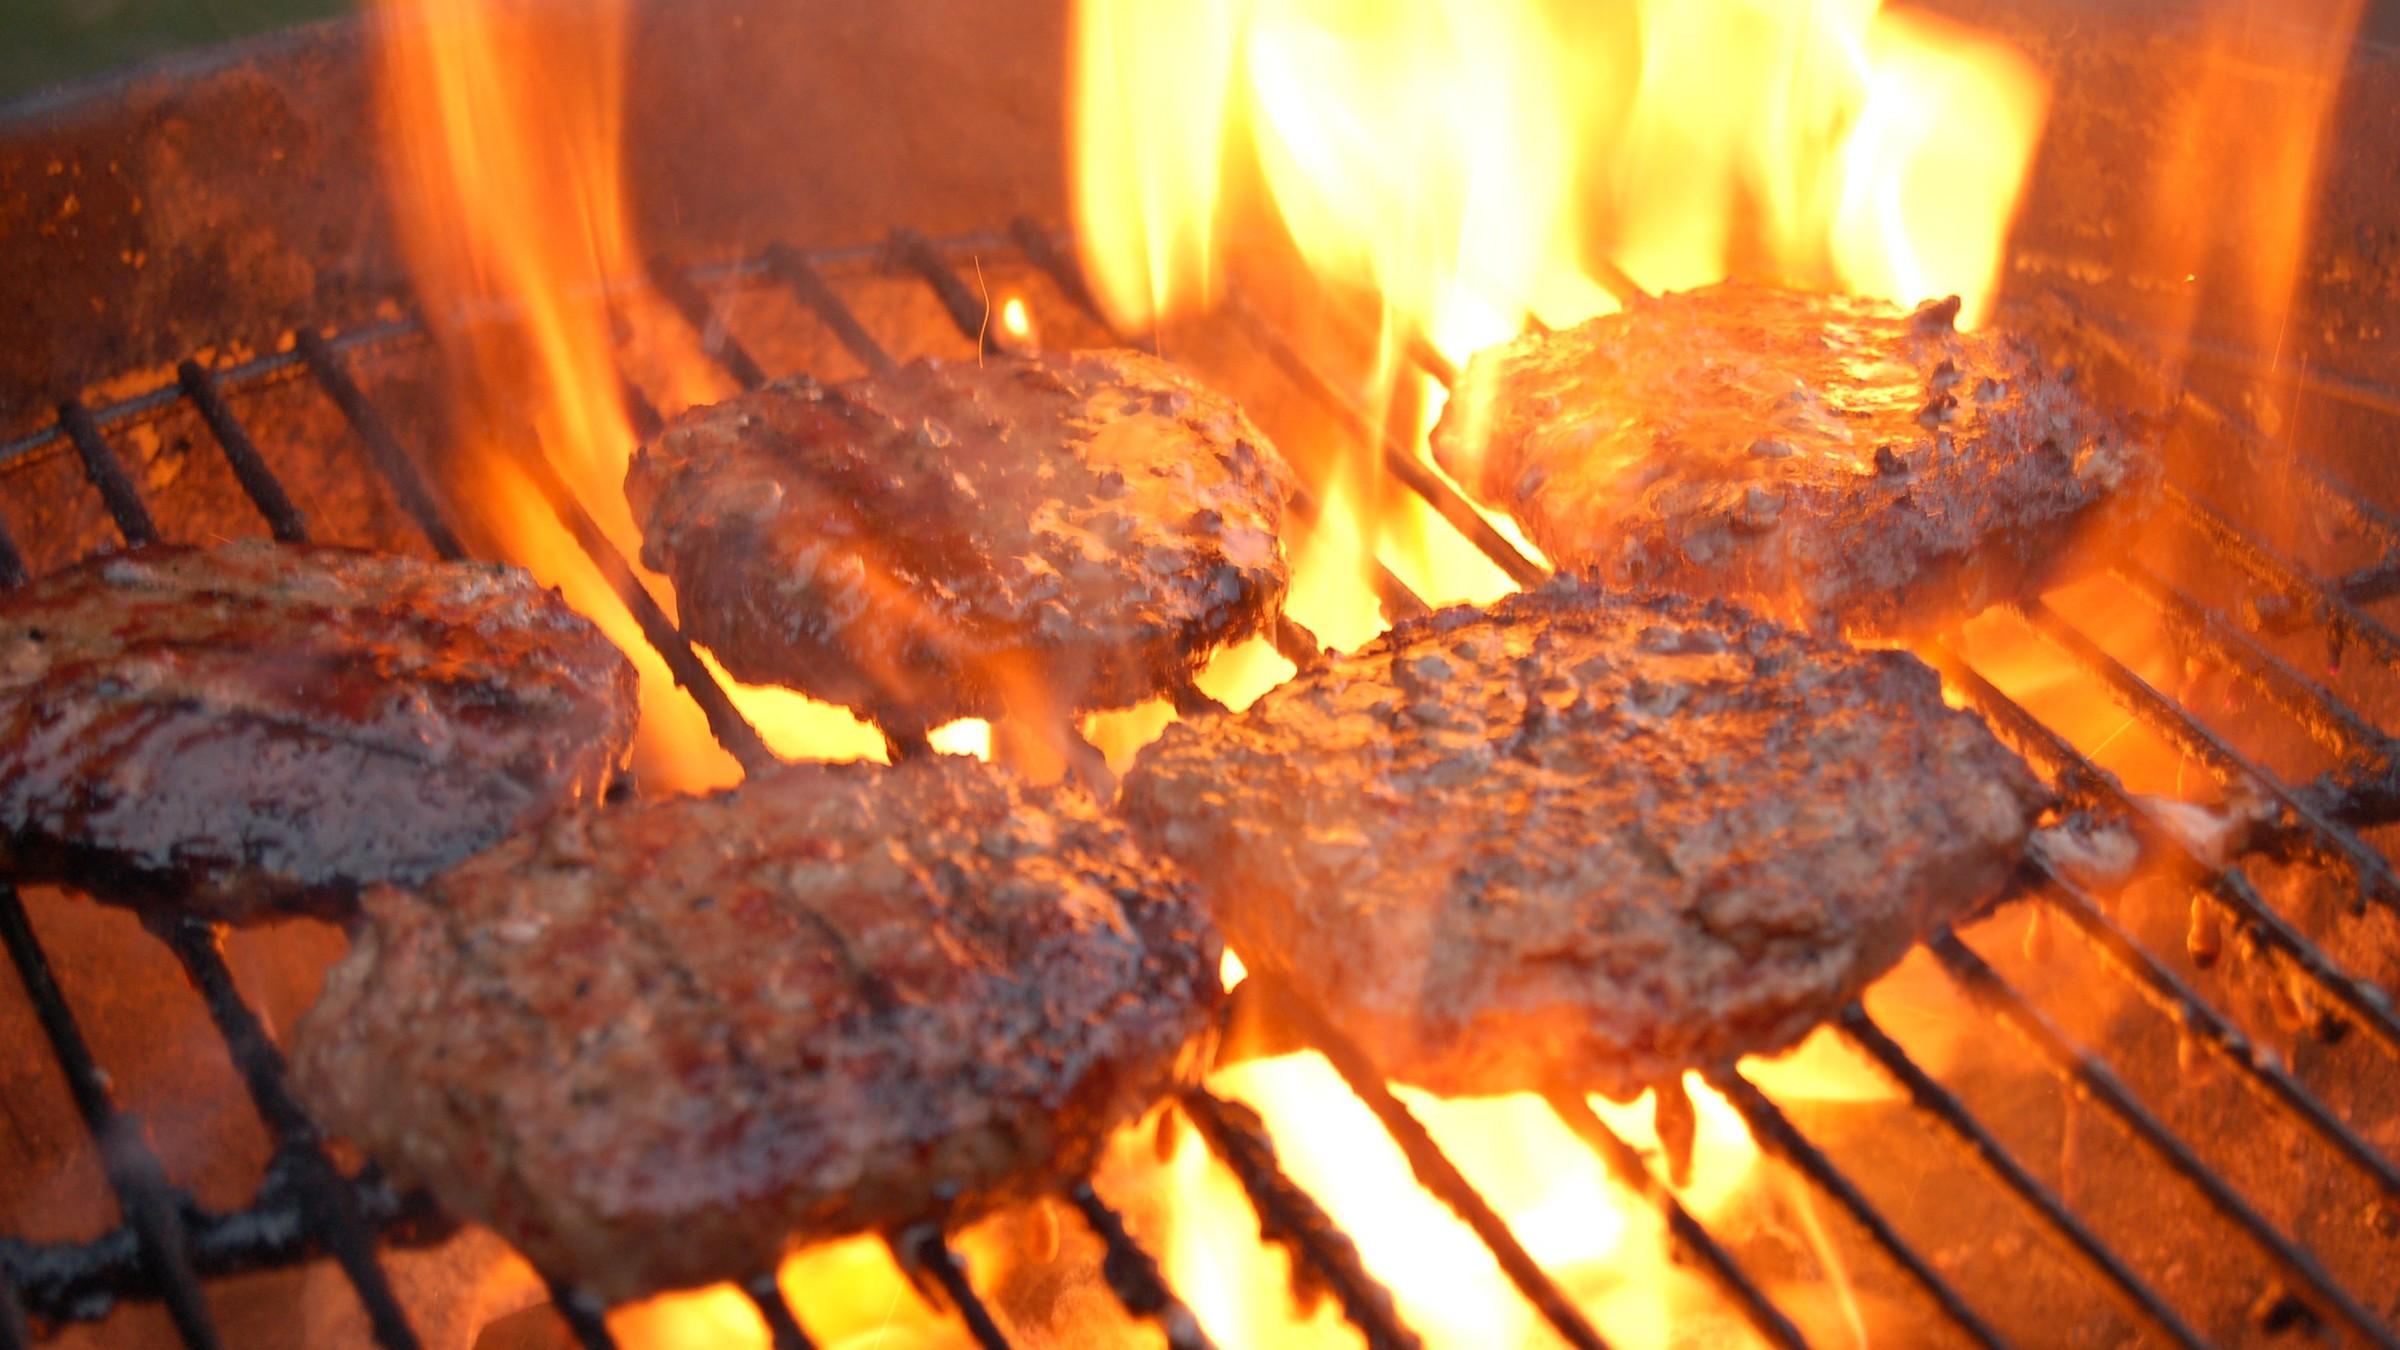 bbq-barbecue-grill-fire-food-2400x1350-wallpaper.jpg